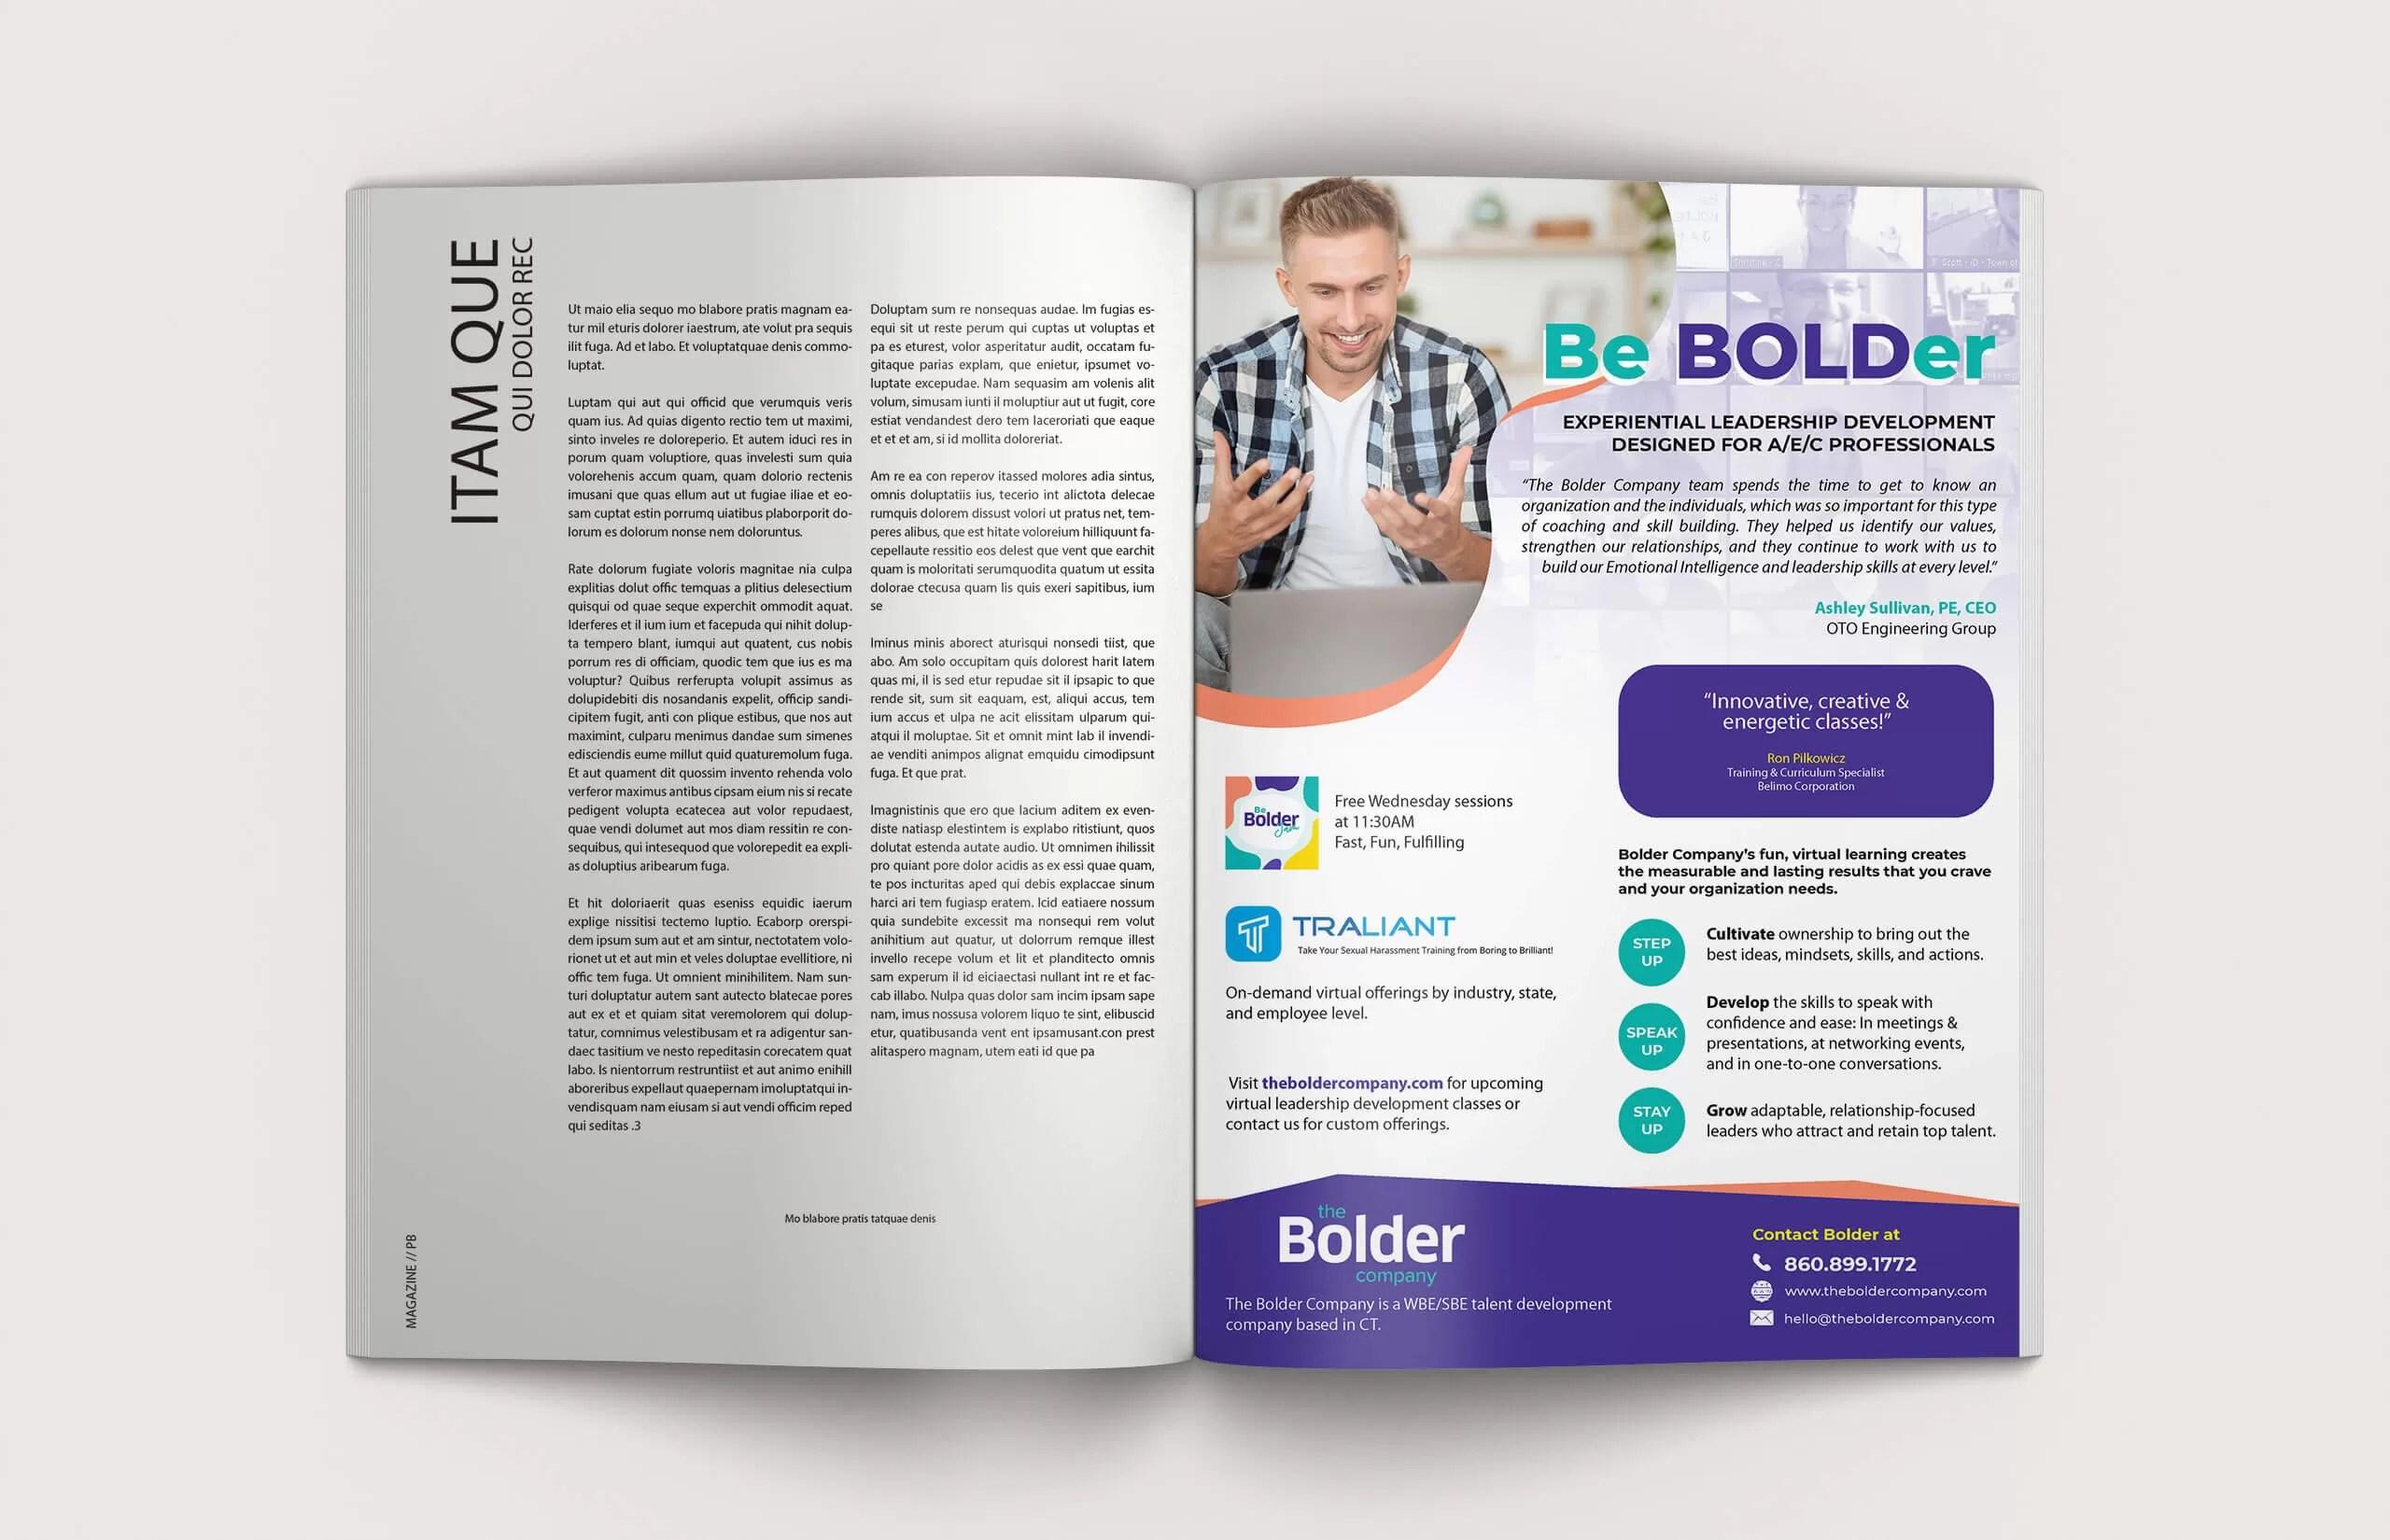 The Bolder Company - Magazine Ad Layout